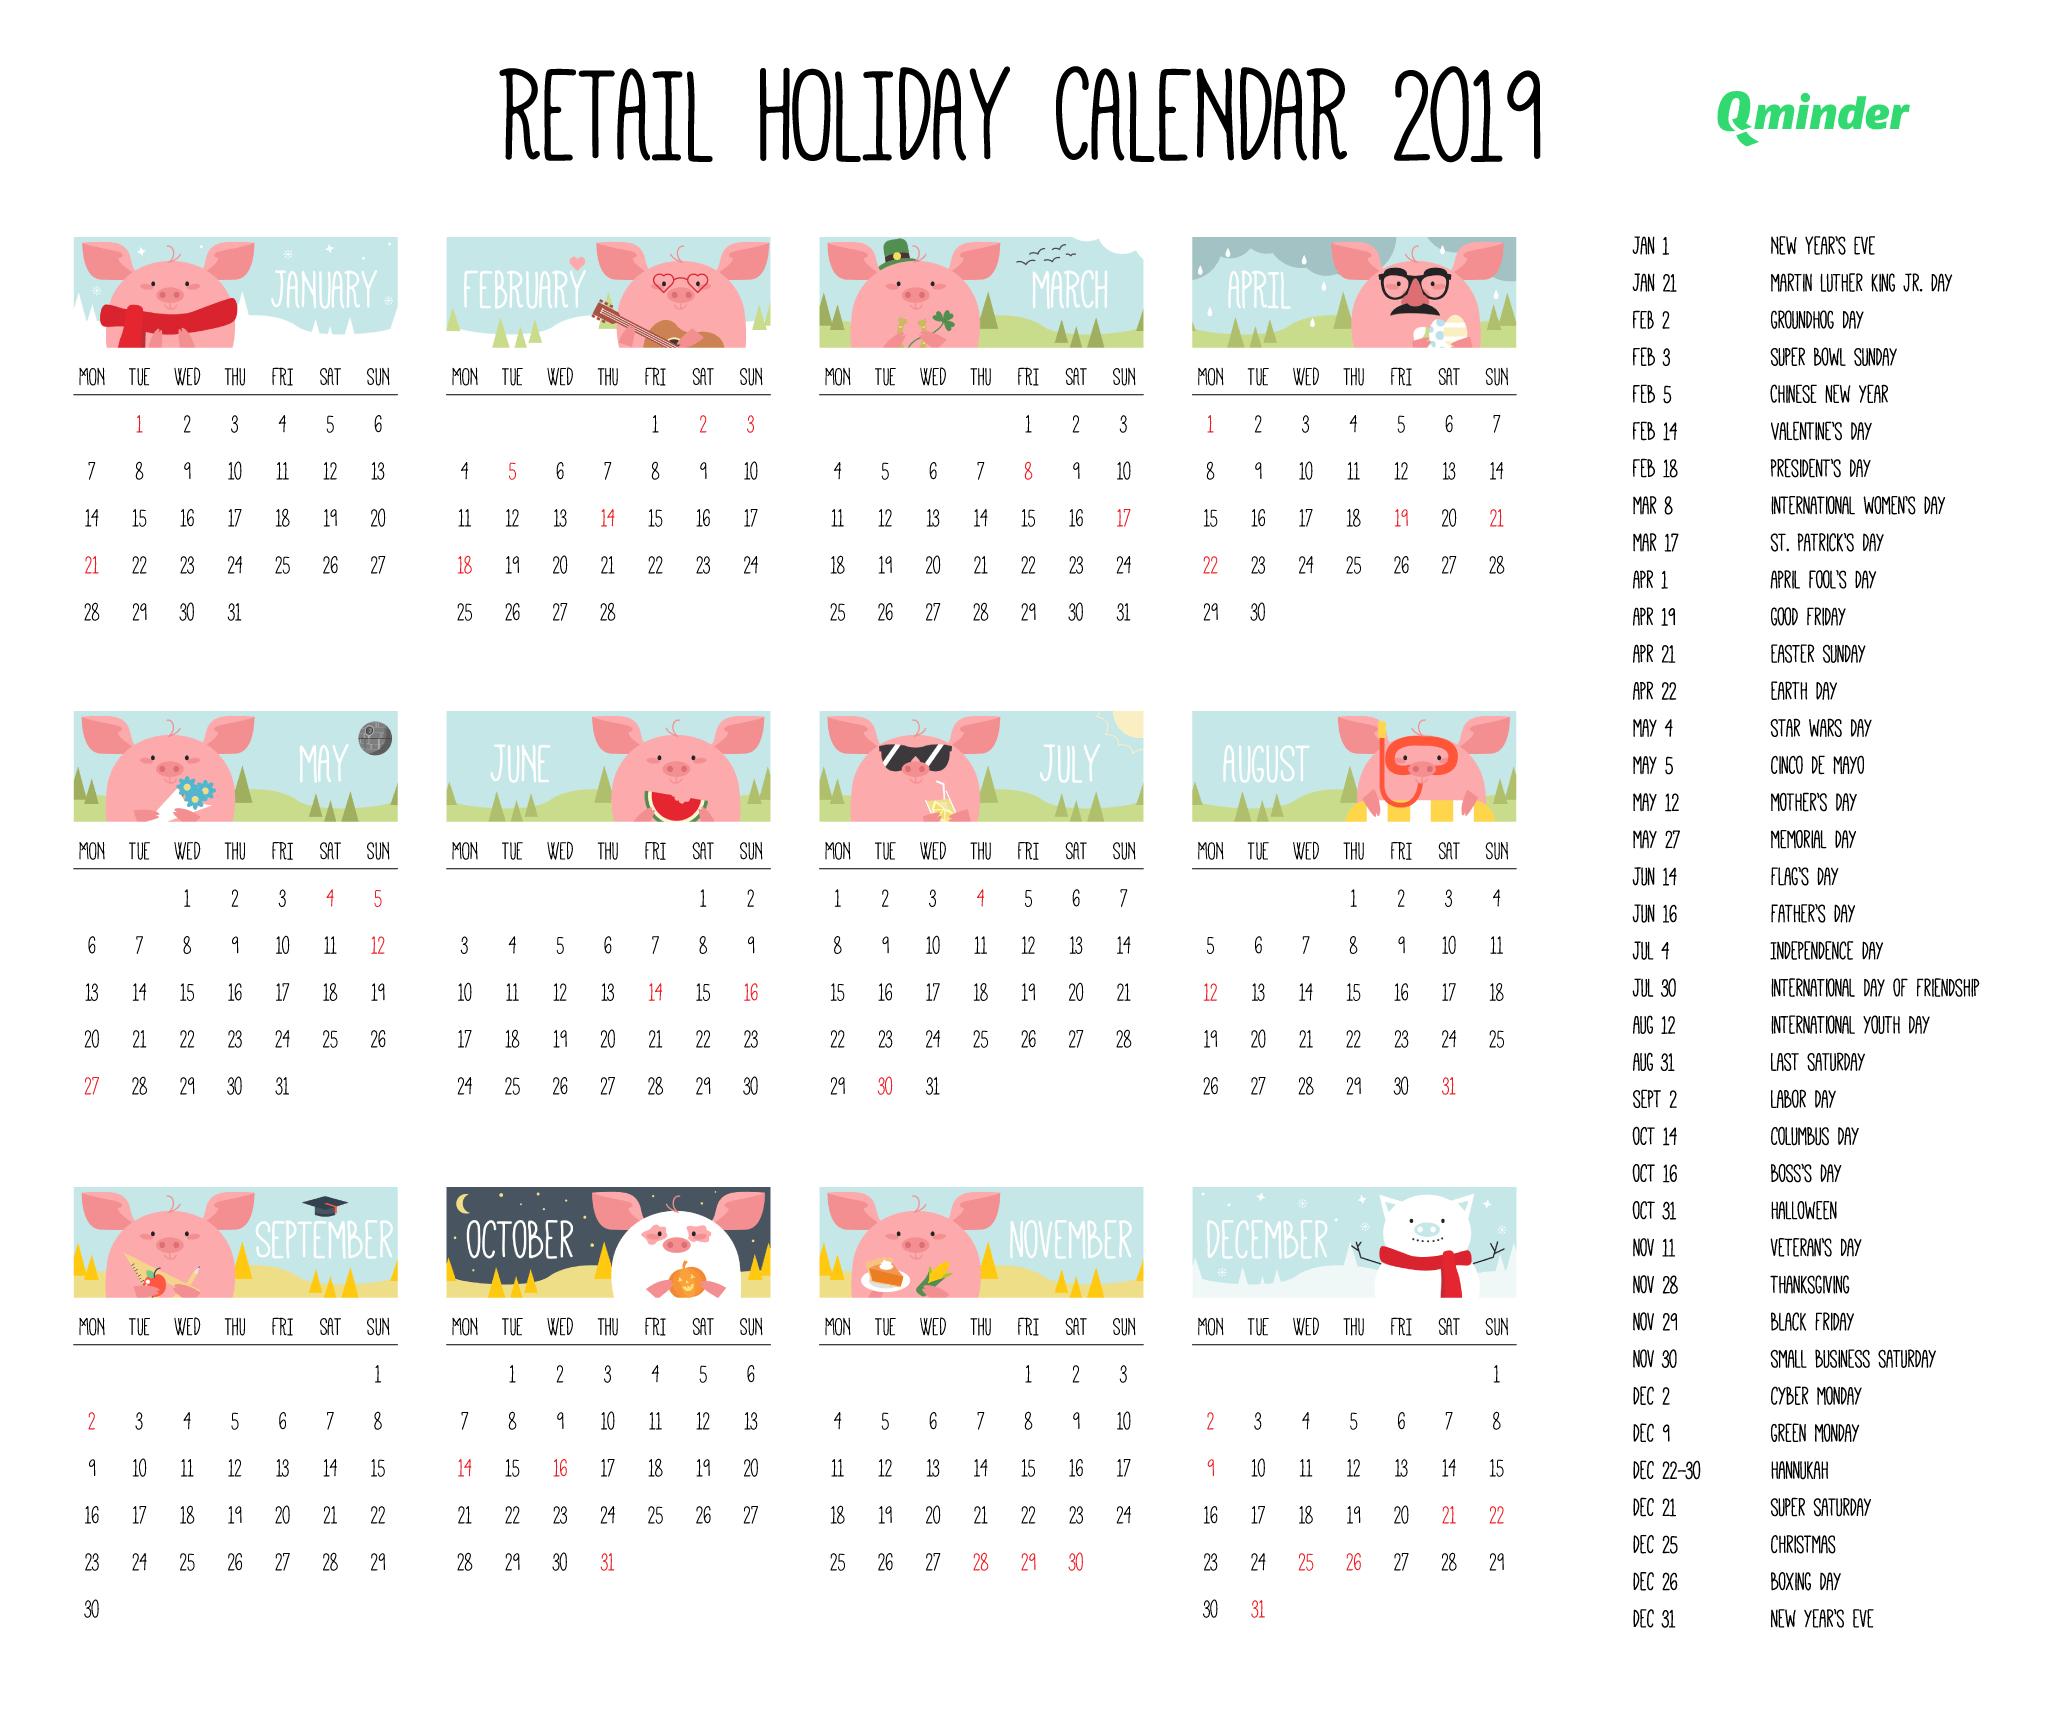 2020 Retail Calendar - Calendar Printable Free with 454 Printable Retail Calendar